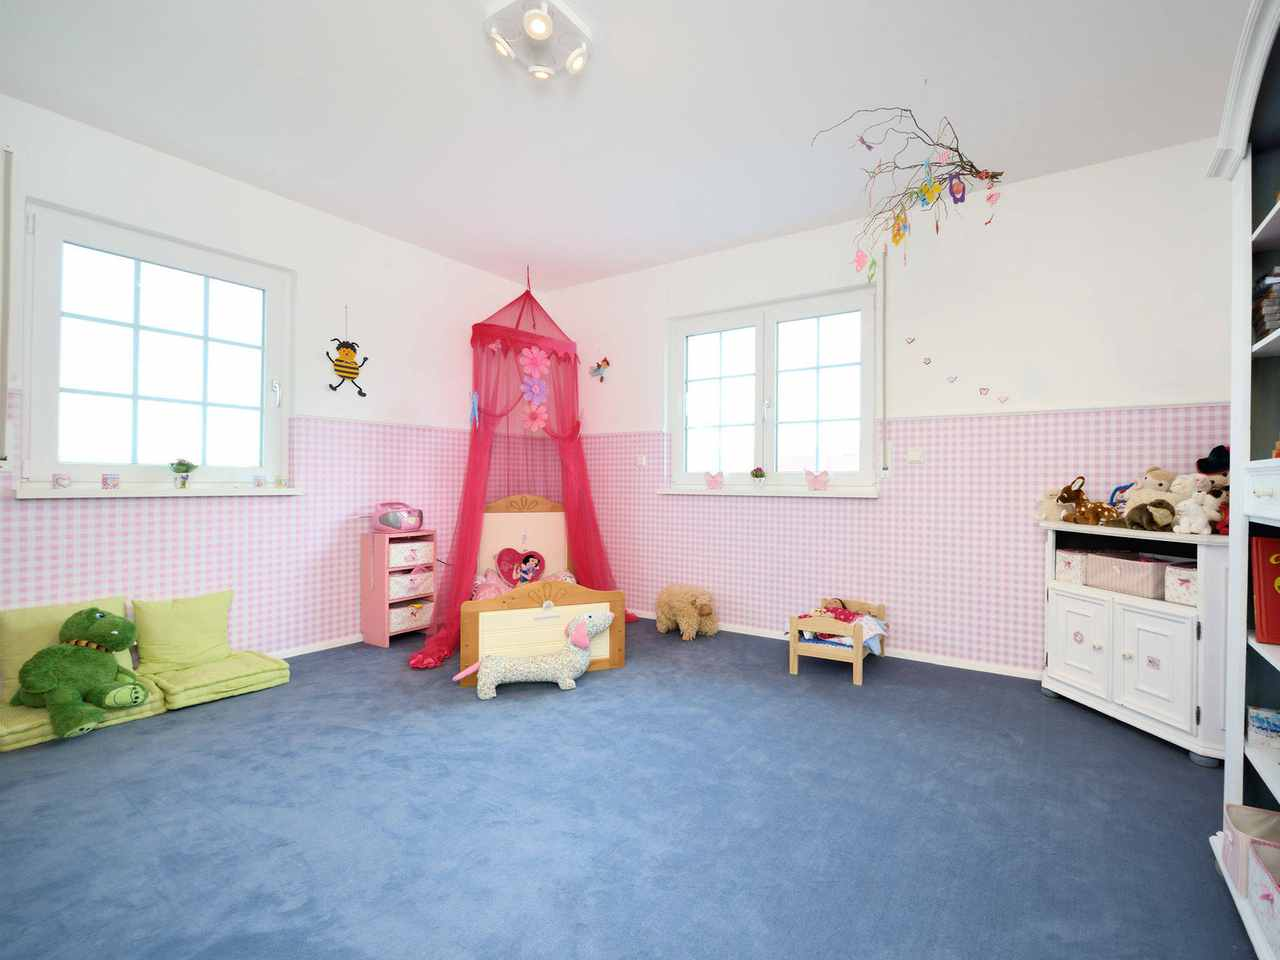 Haus Winter Kinderzimmer Mädchen Fertighaus Weiss